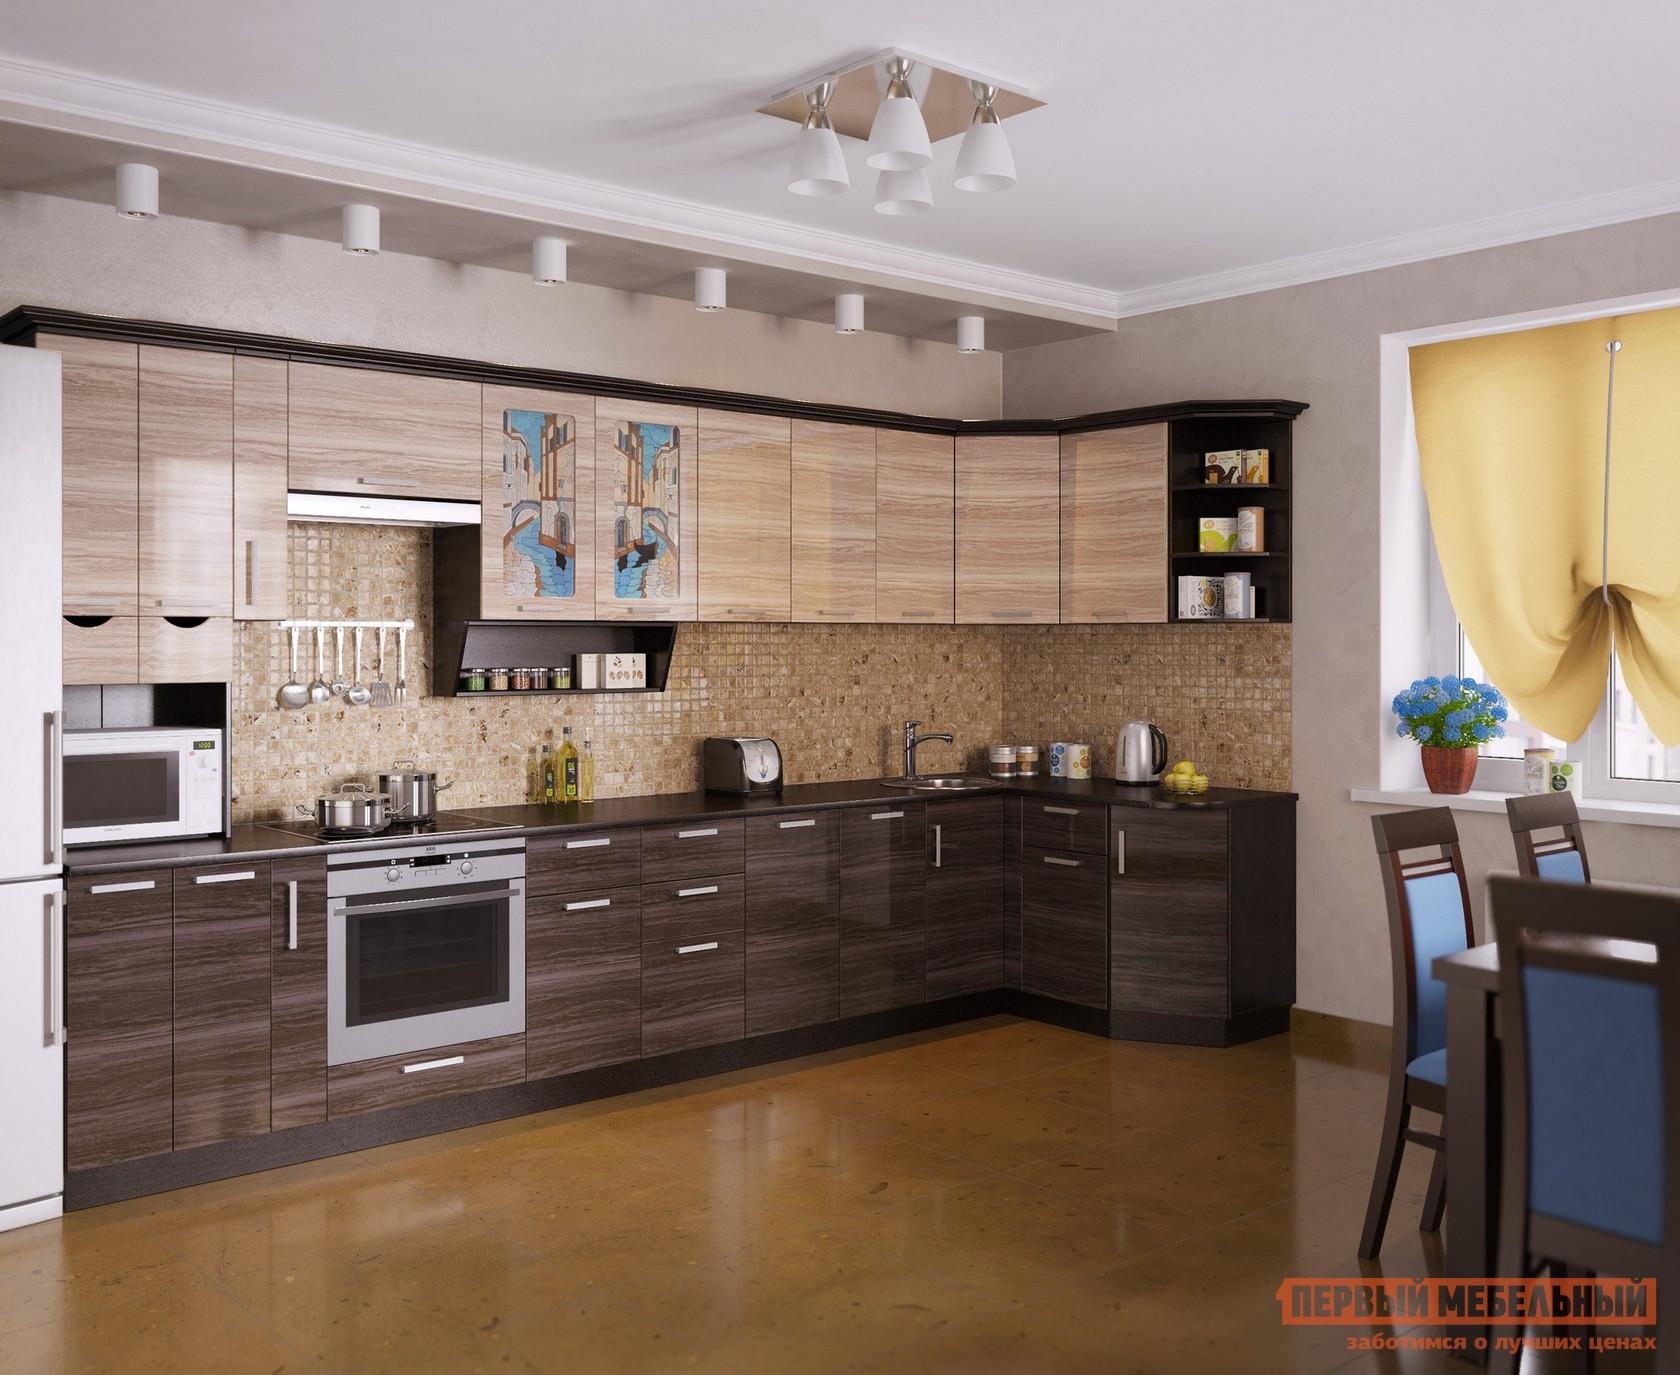 Кухонный гарнитур МО РОСТ Венеция 5 Угол кухонный гарнитур трия фэнтези 120 см